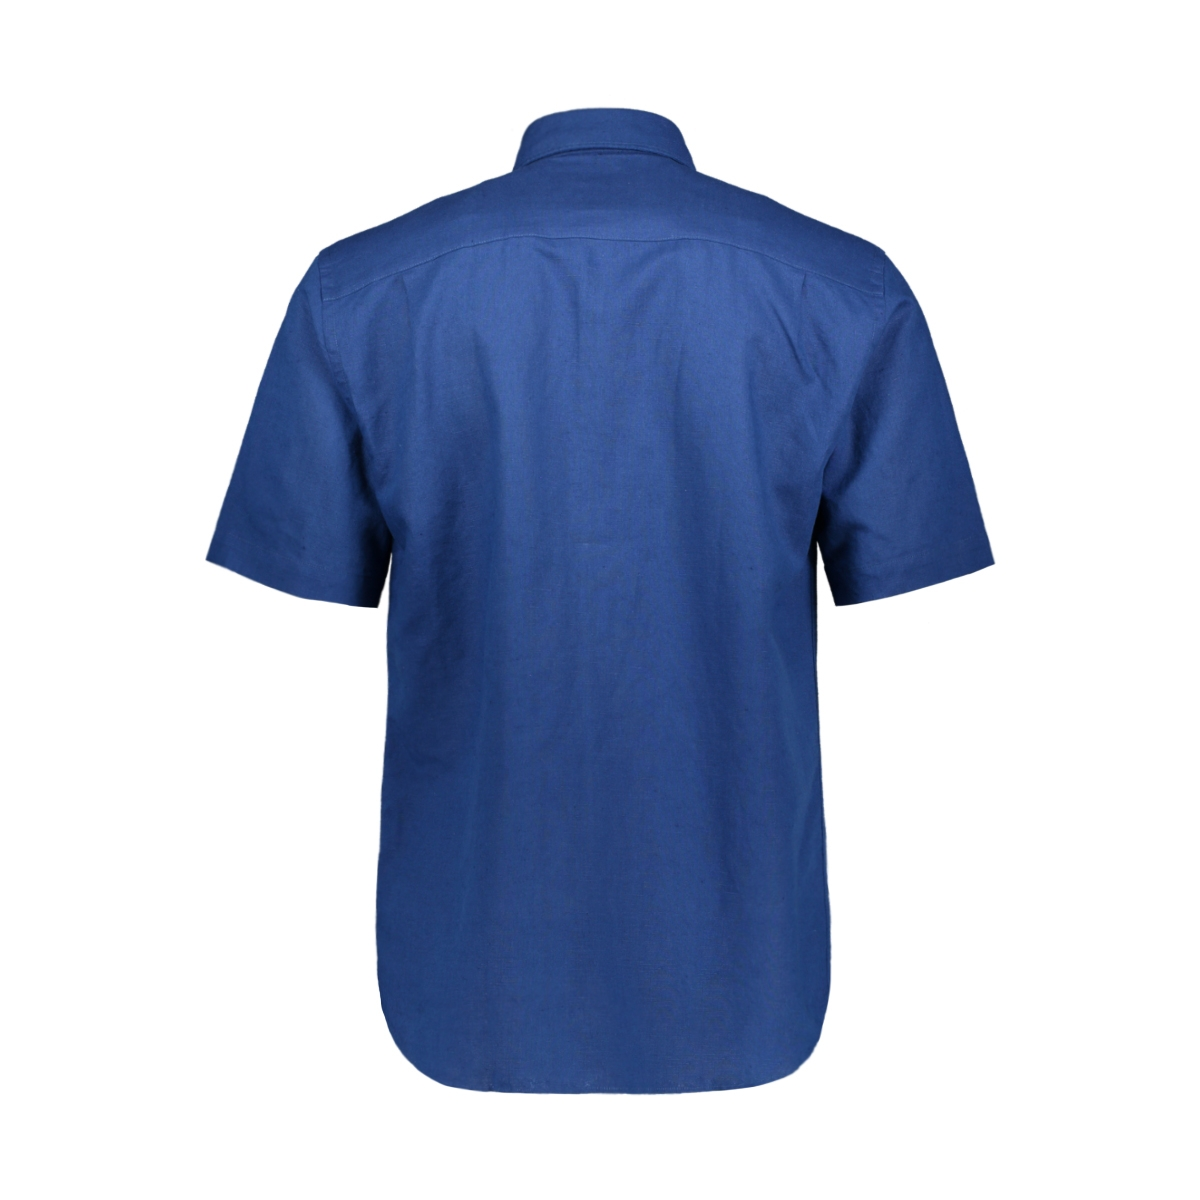 casual overhemd km 052907 campbell overhemd 381 donkerblauw uni